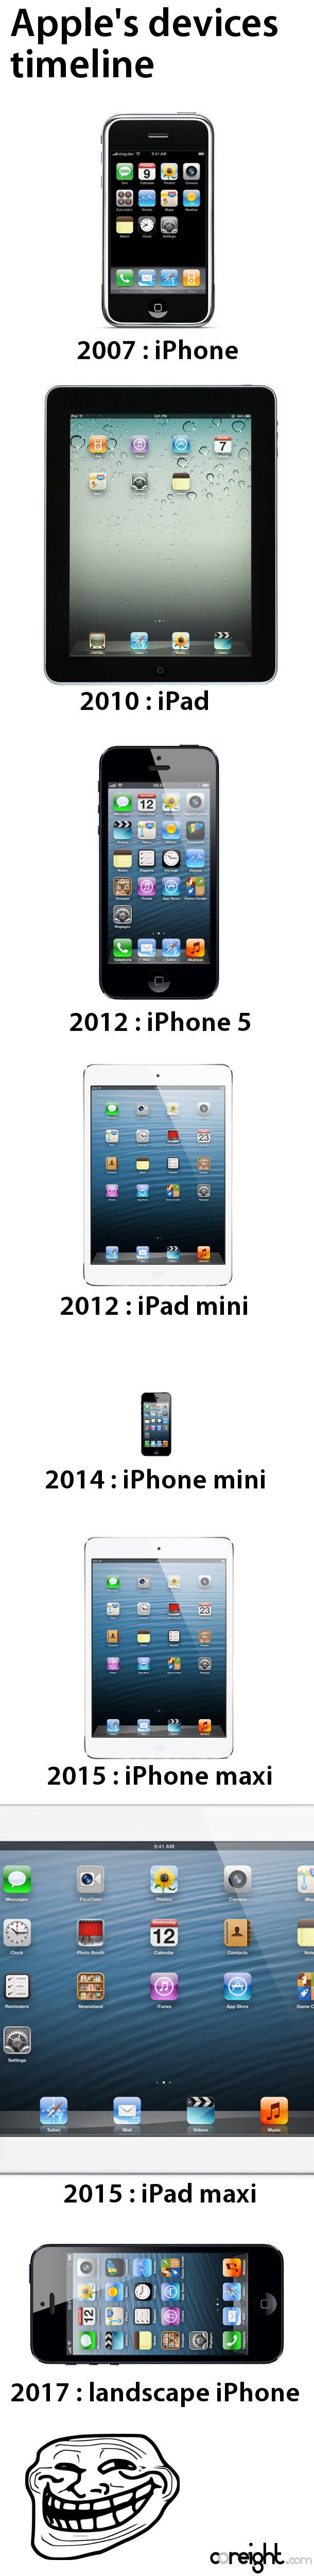 Timeline produits Apple